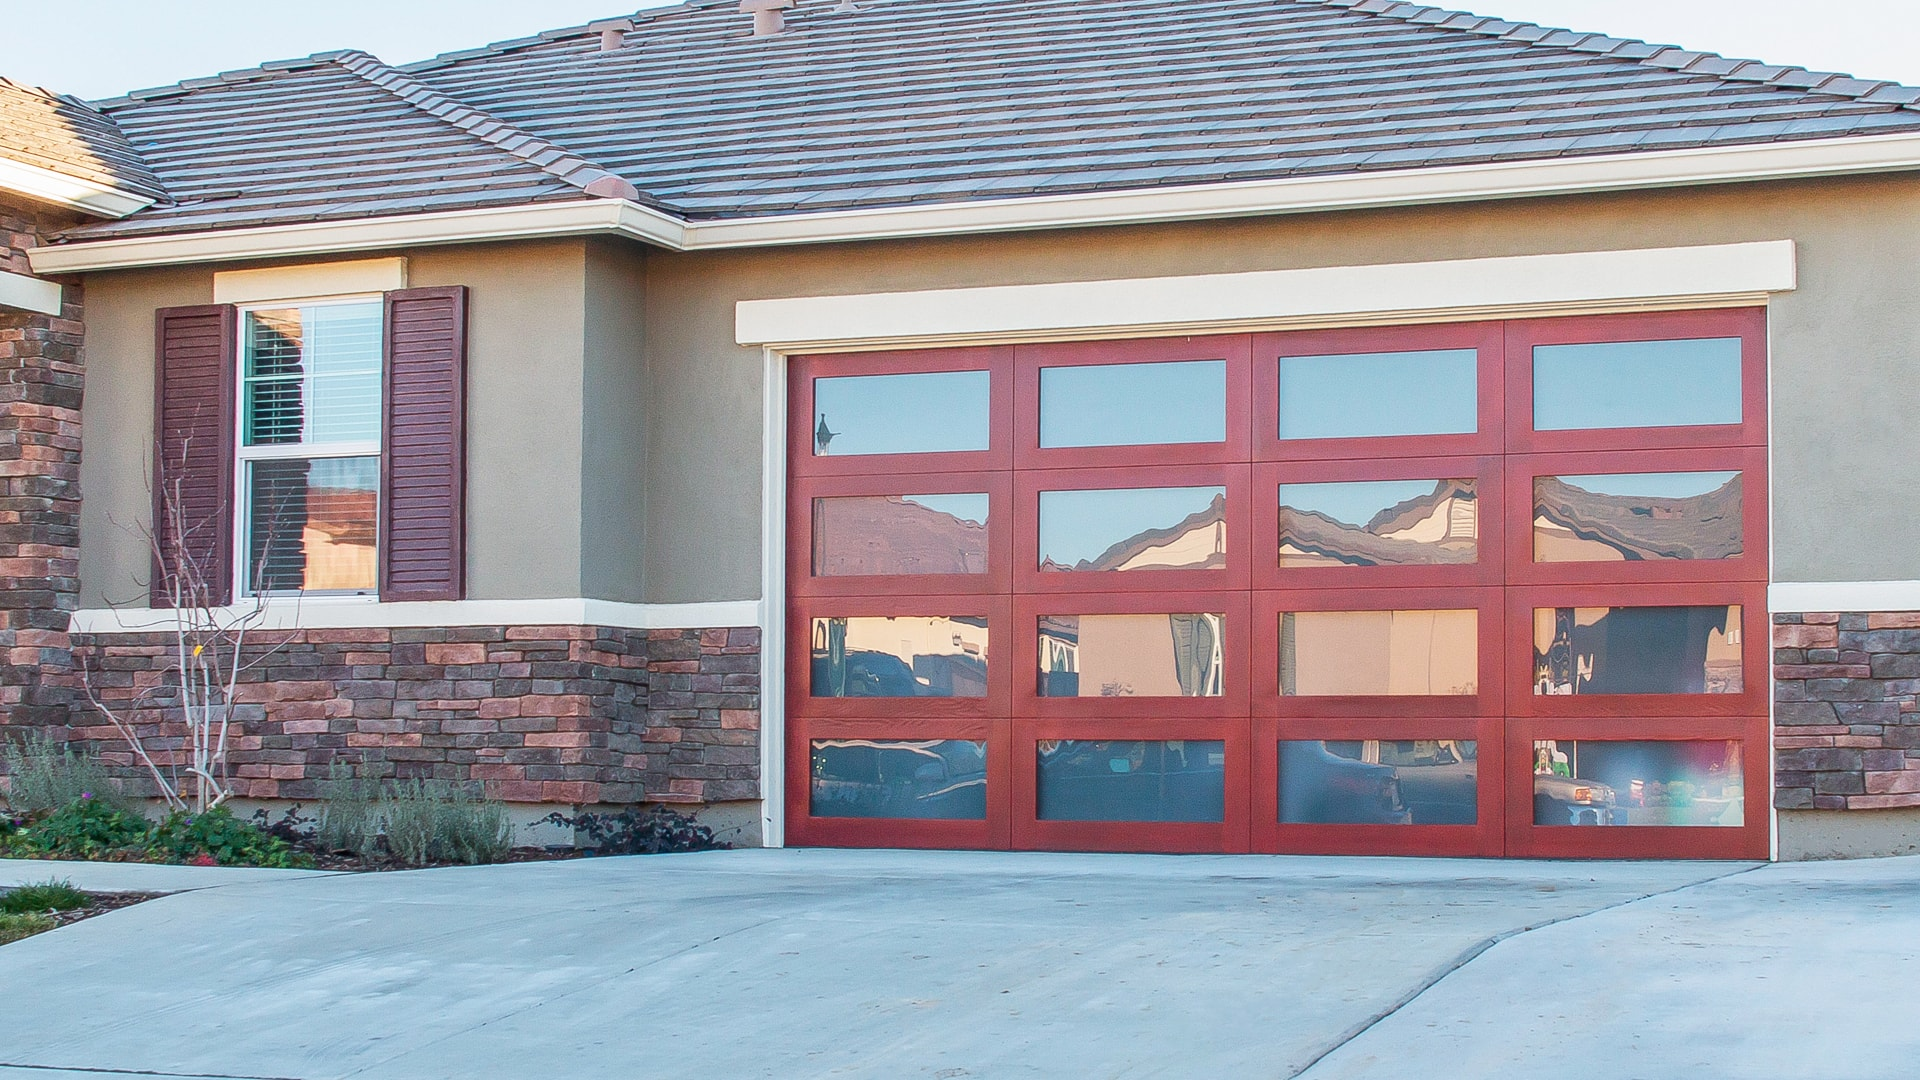 Carlos auto repair tire center in north hollywood ca for Garage door repair hollywood